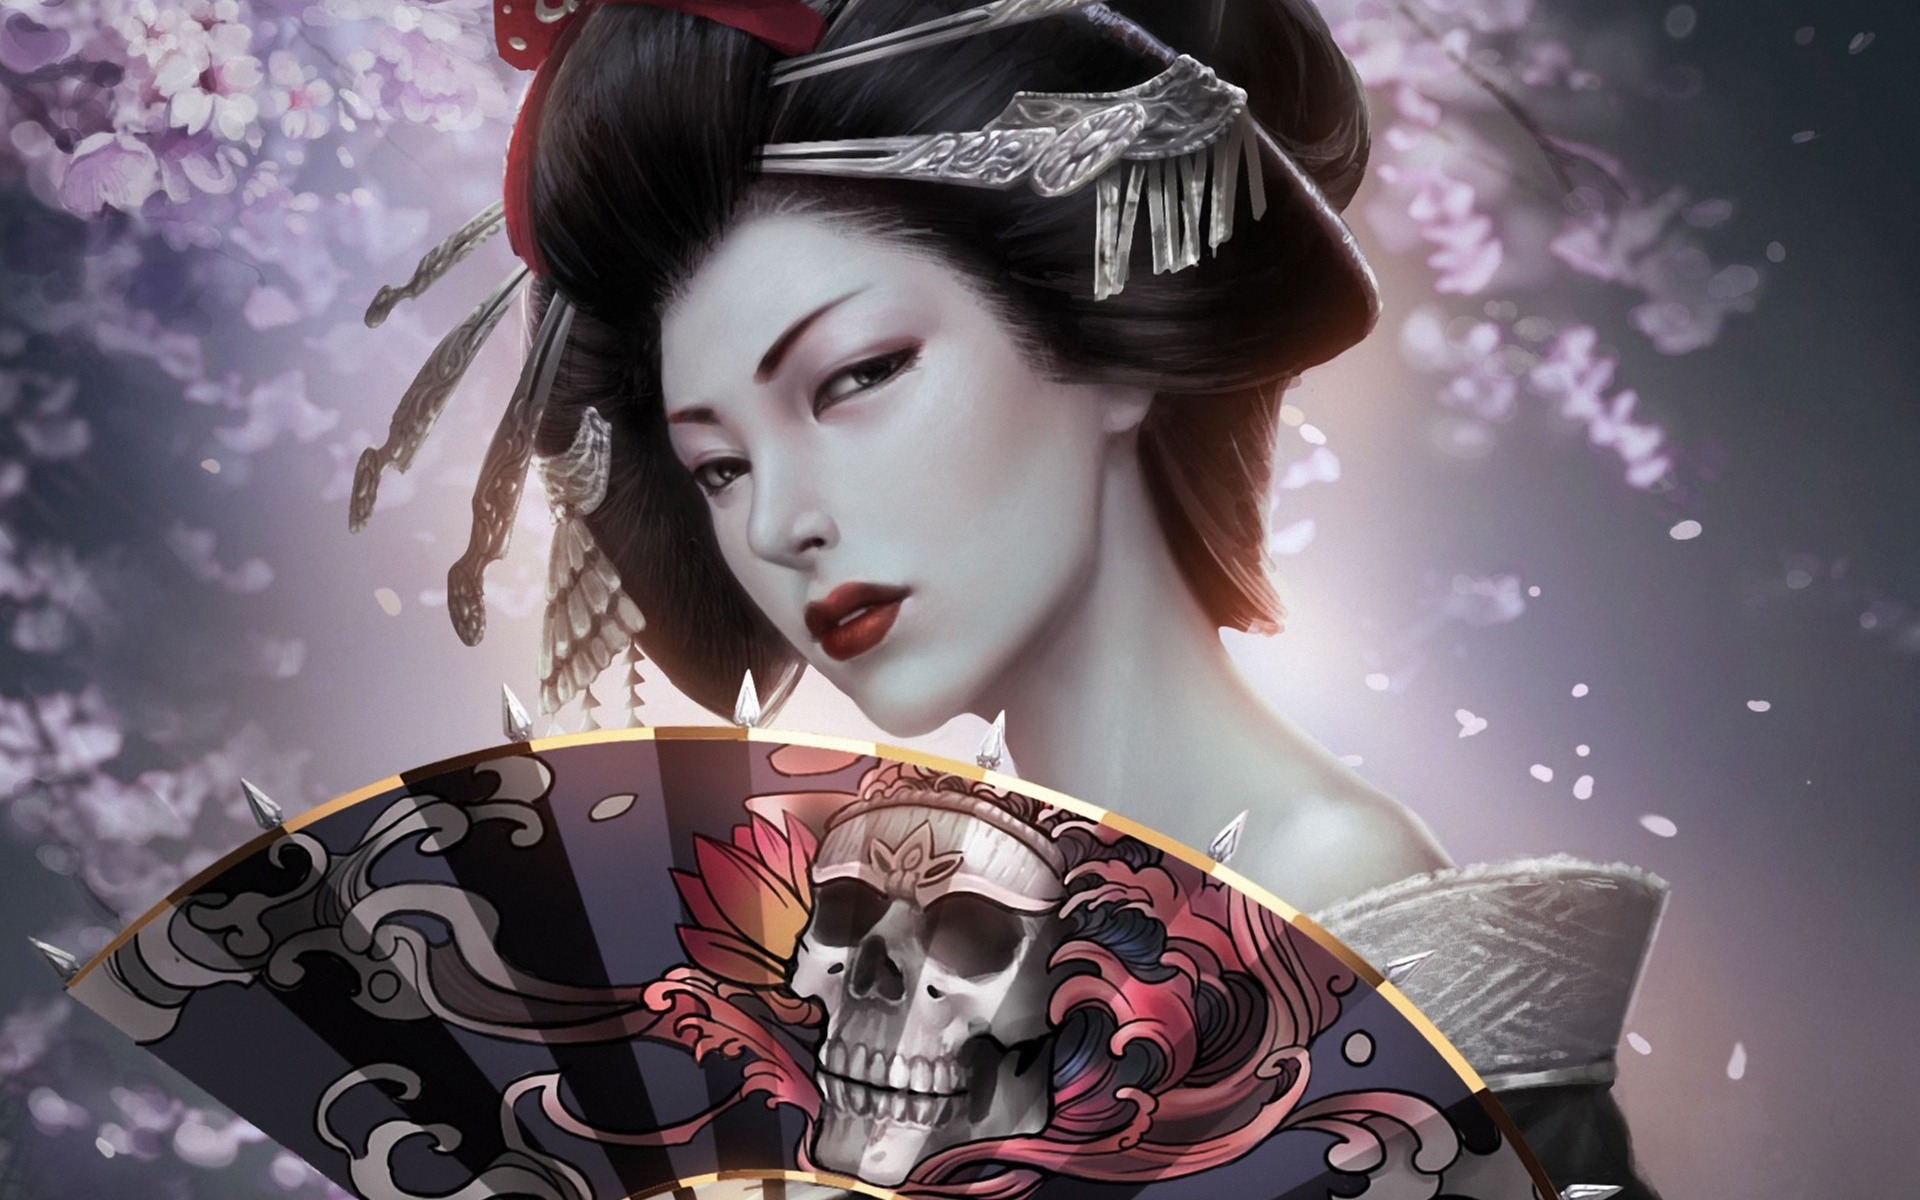 Japanese Girl Geisha Skull Art HD Wallpaper 1920x1200